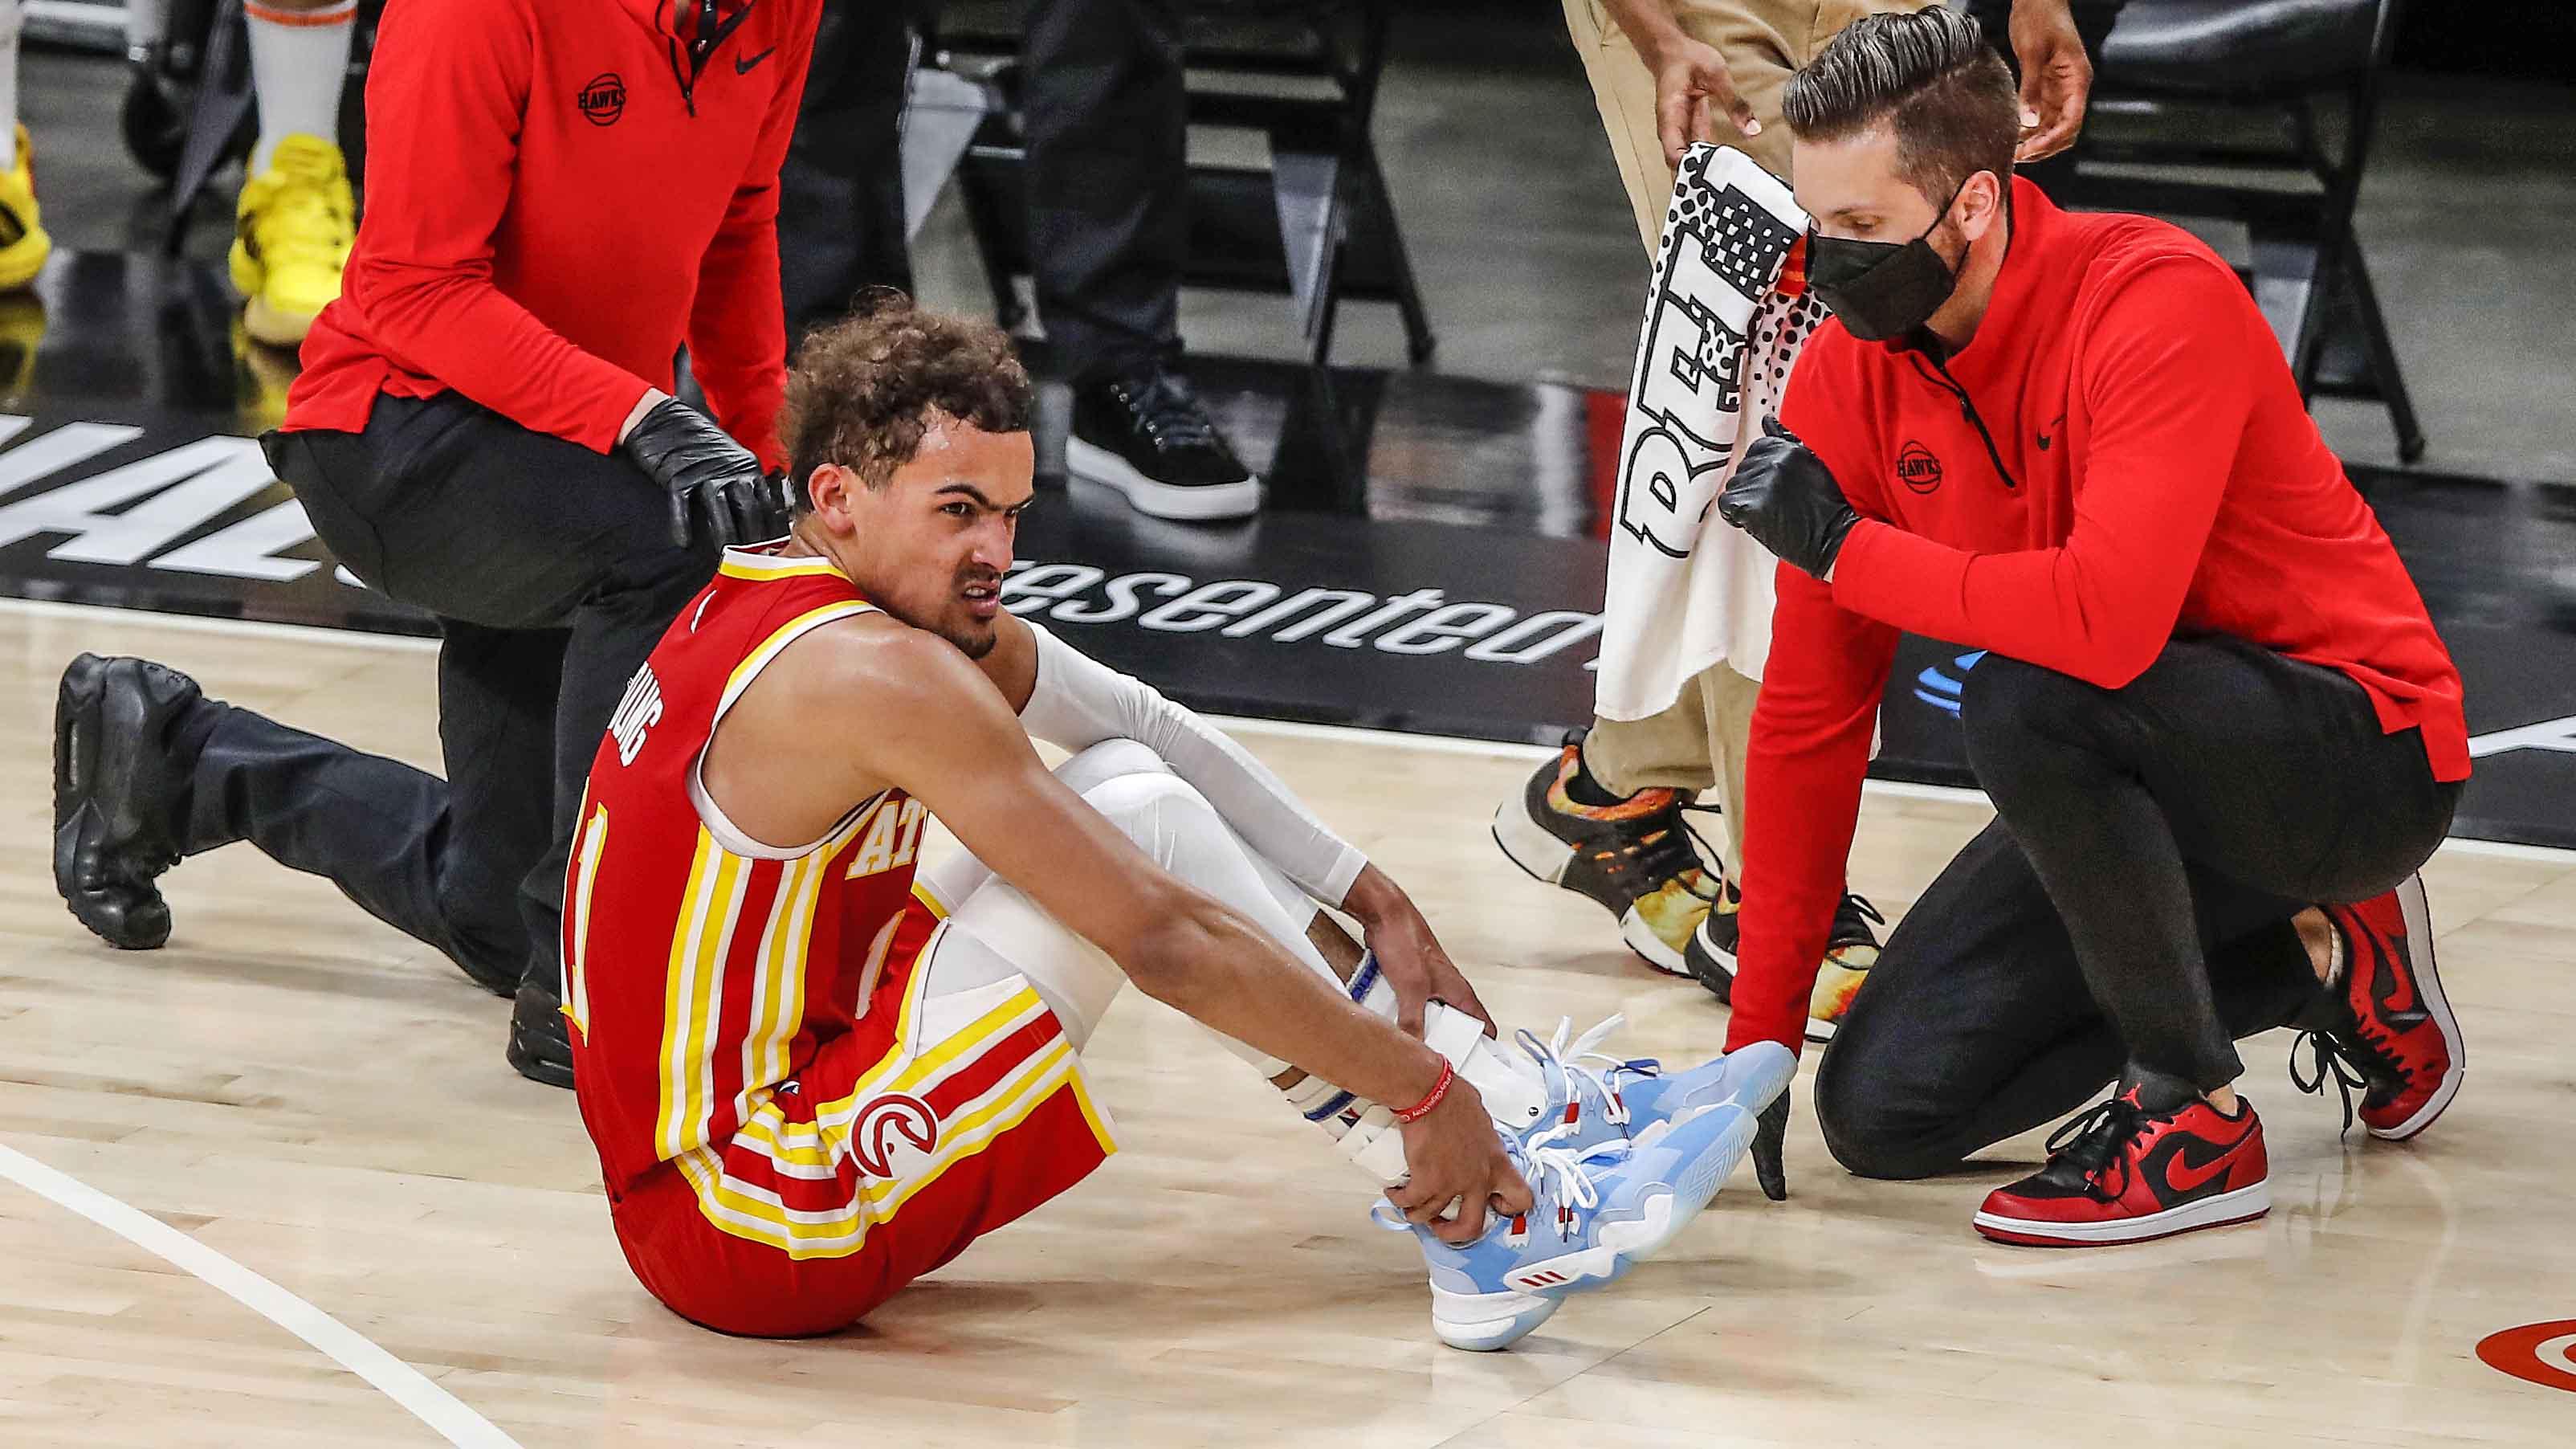 NBA playoffs: Top moments from Milwaukee Bucks vs. Atlanta Hawks Game 4